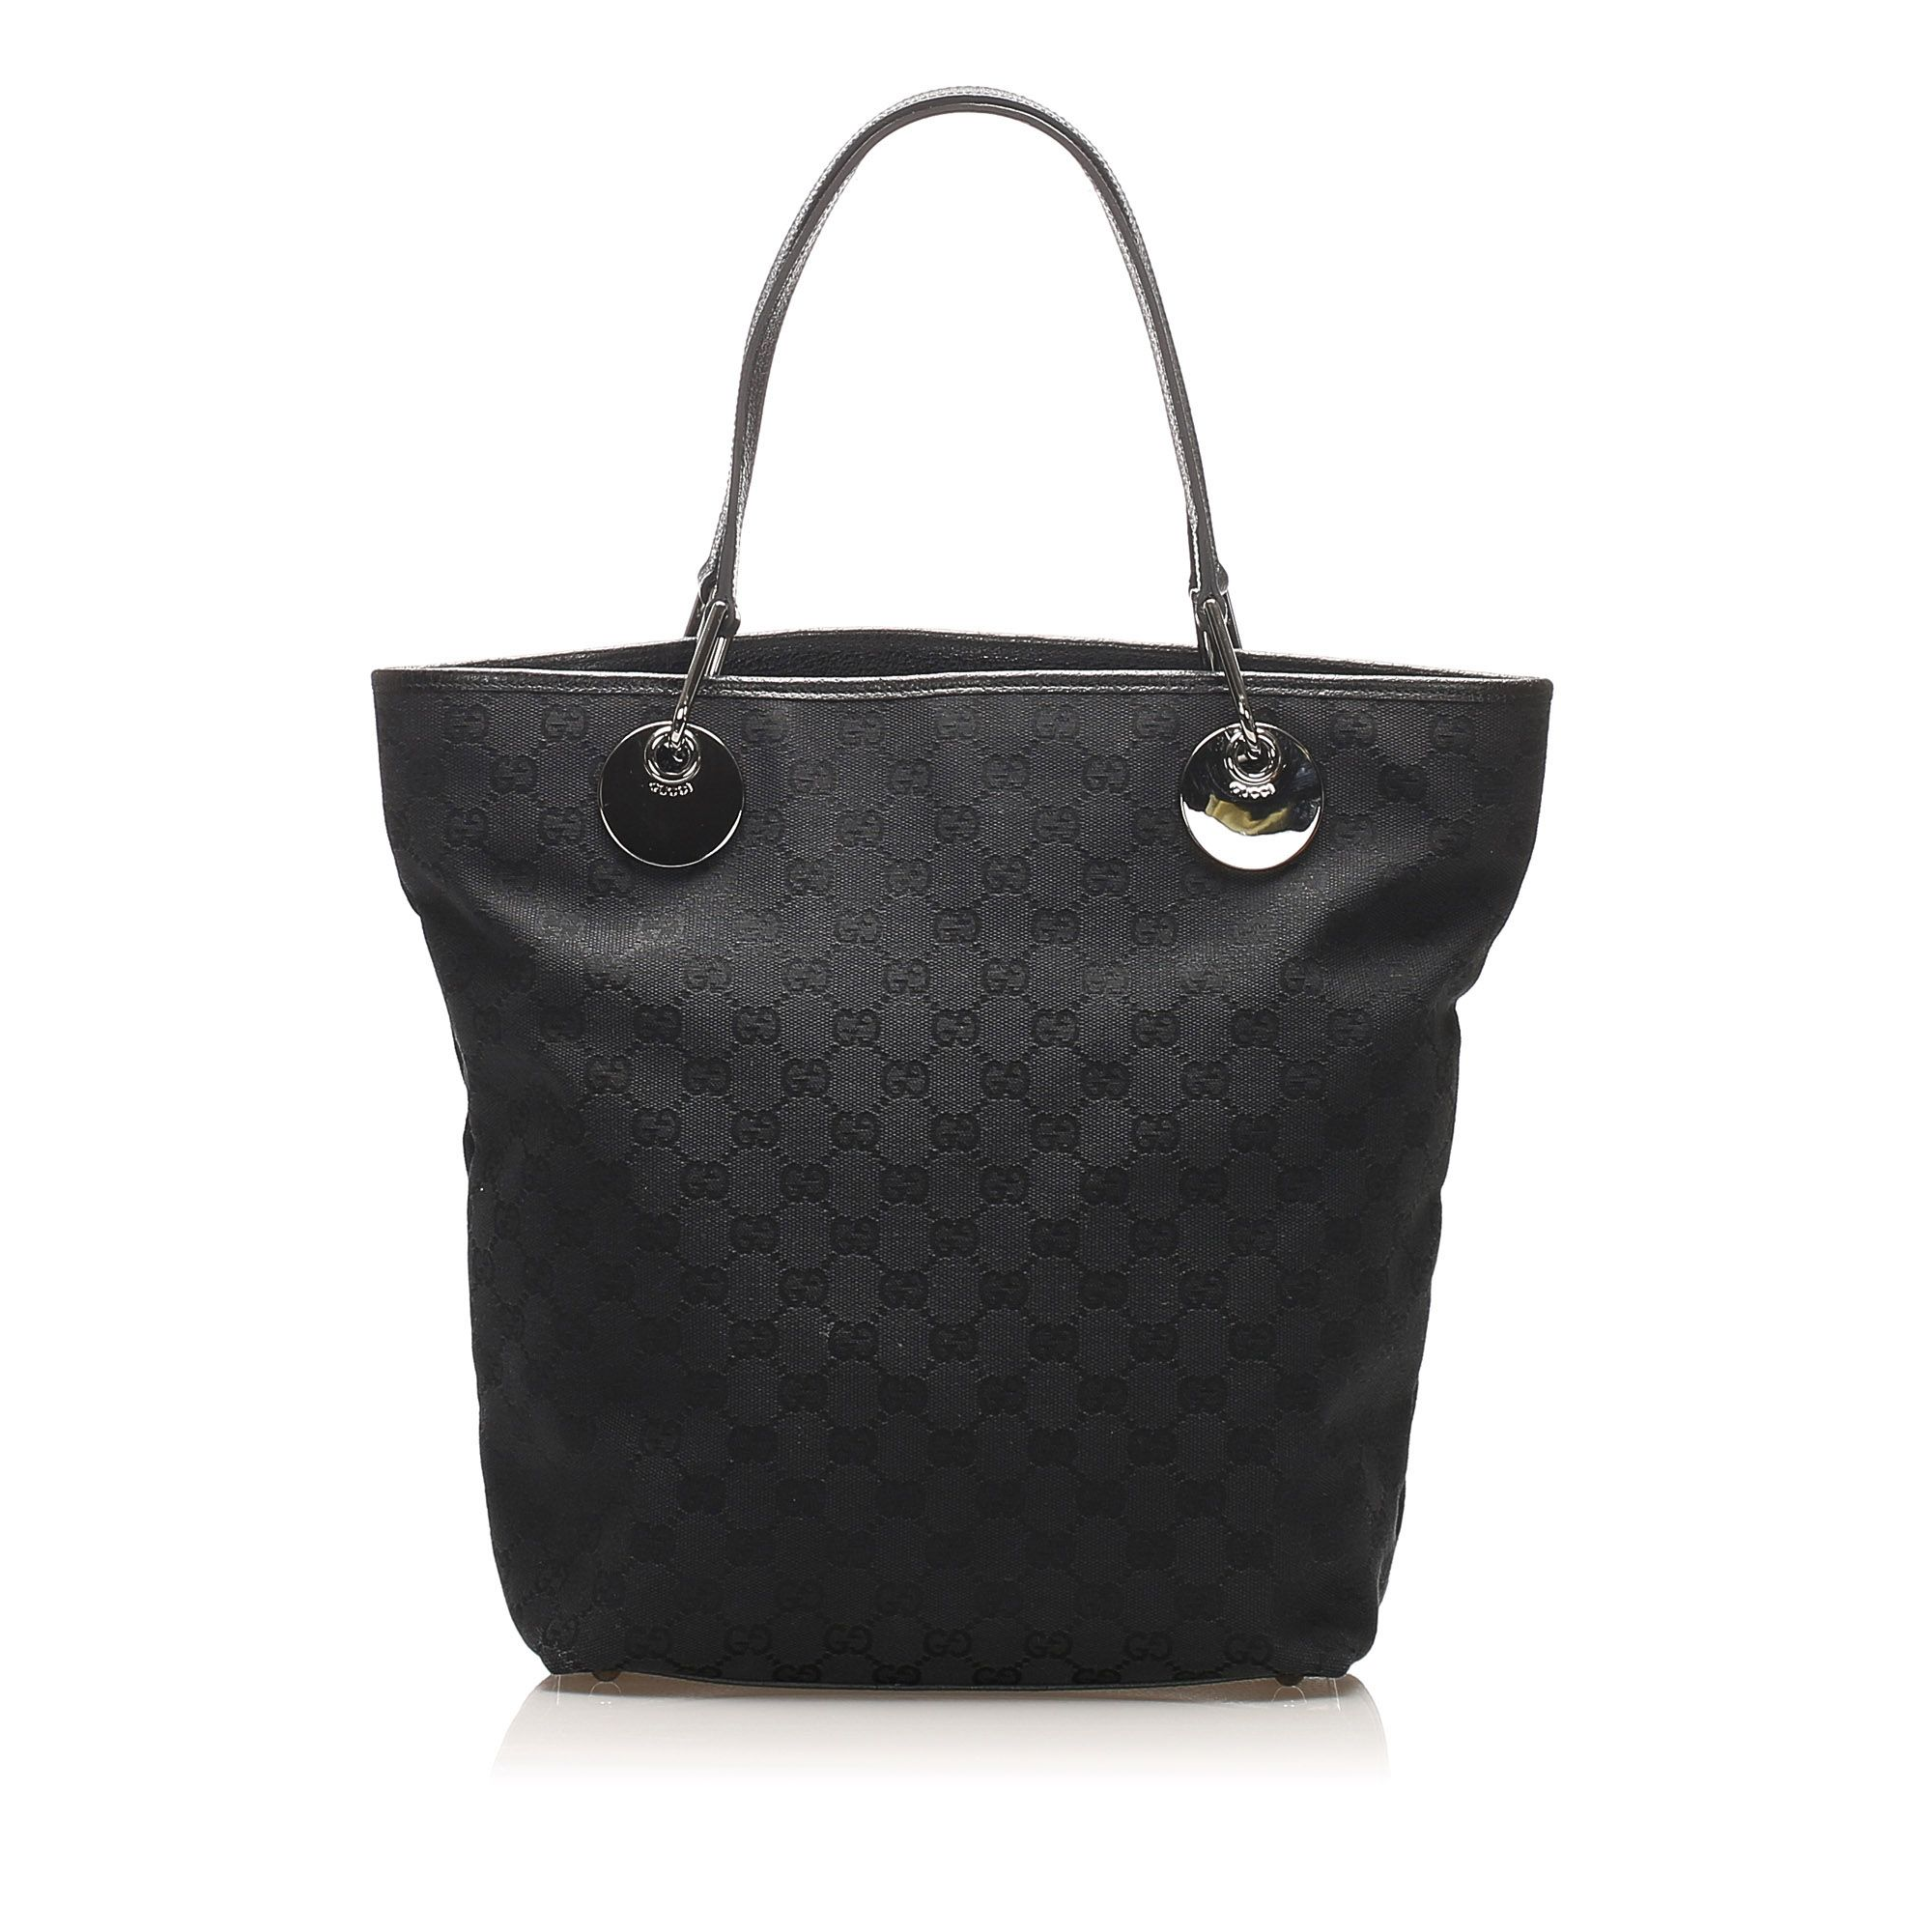 Vintage Gucci GG Canvas Eclipse Tote Bag Black